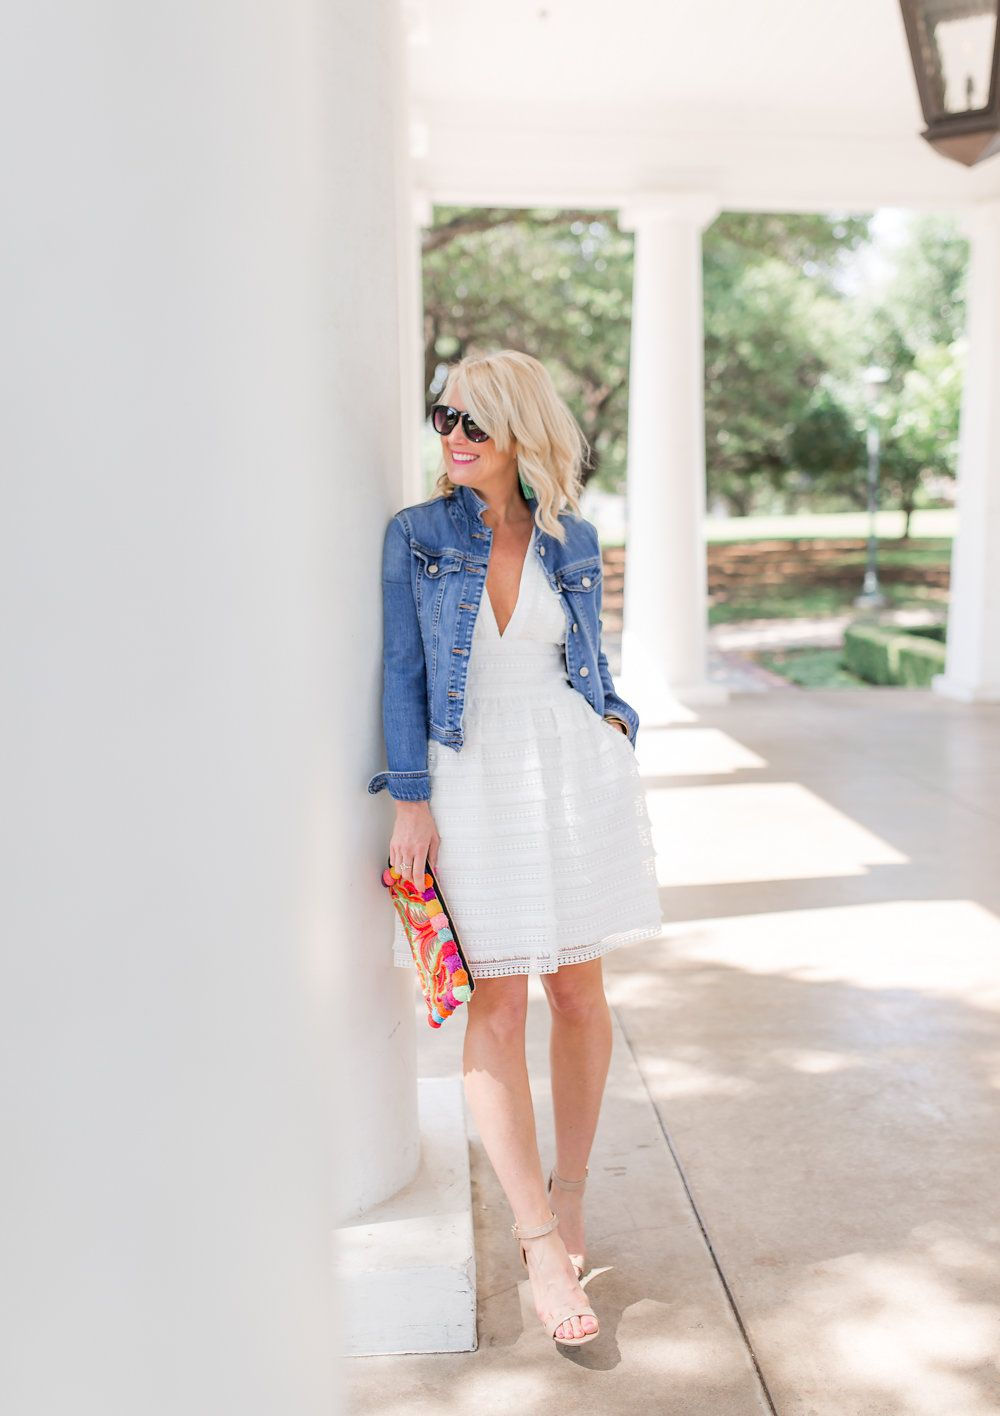 Jean Jacket White Dress Hi Sugarplum Dress With Jean Jacket Summer Fashion Casual Dress Outfits [ 1416 x 1000 Pixel ]